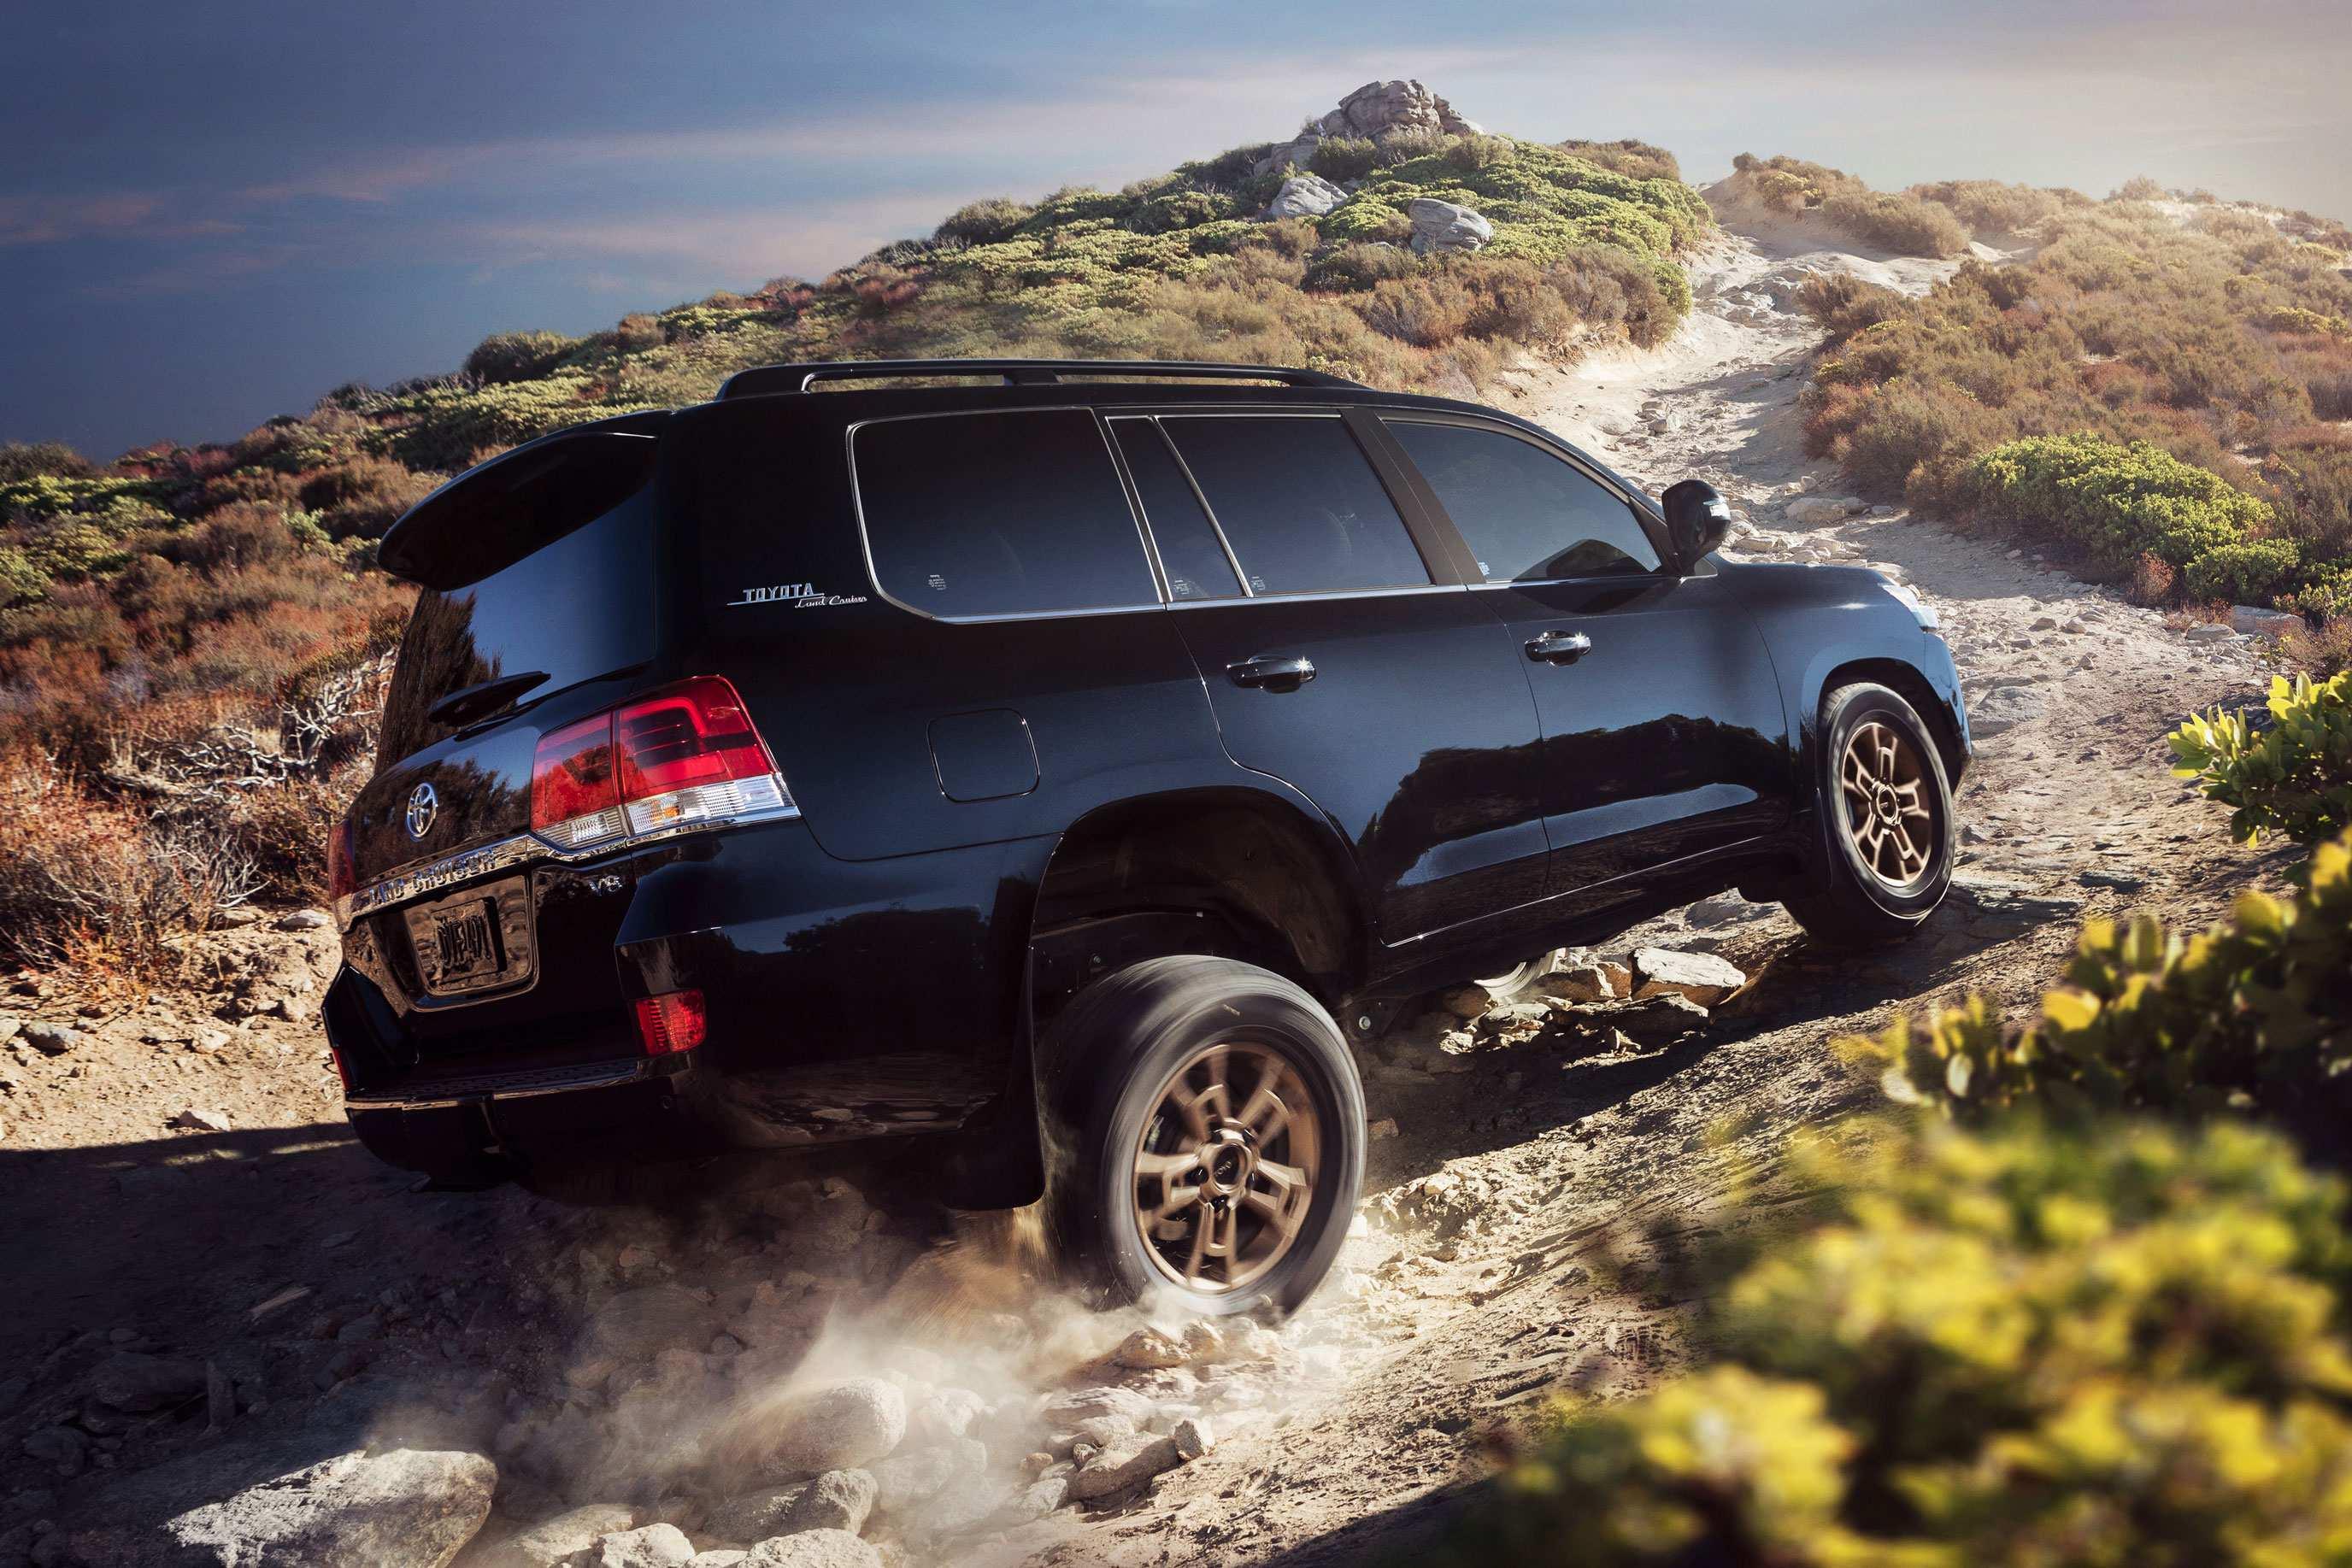 56 New Toyota Land Cruiser 2020 Prices with Toyota Land Cruiser 2020